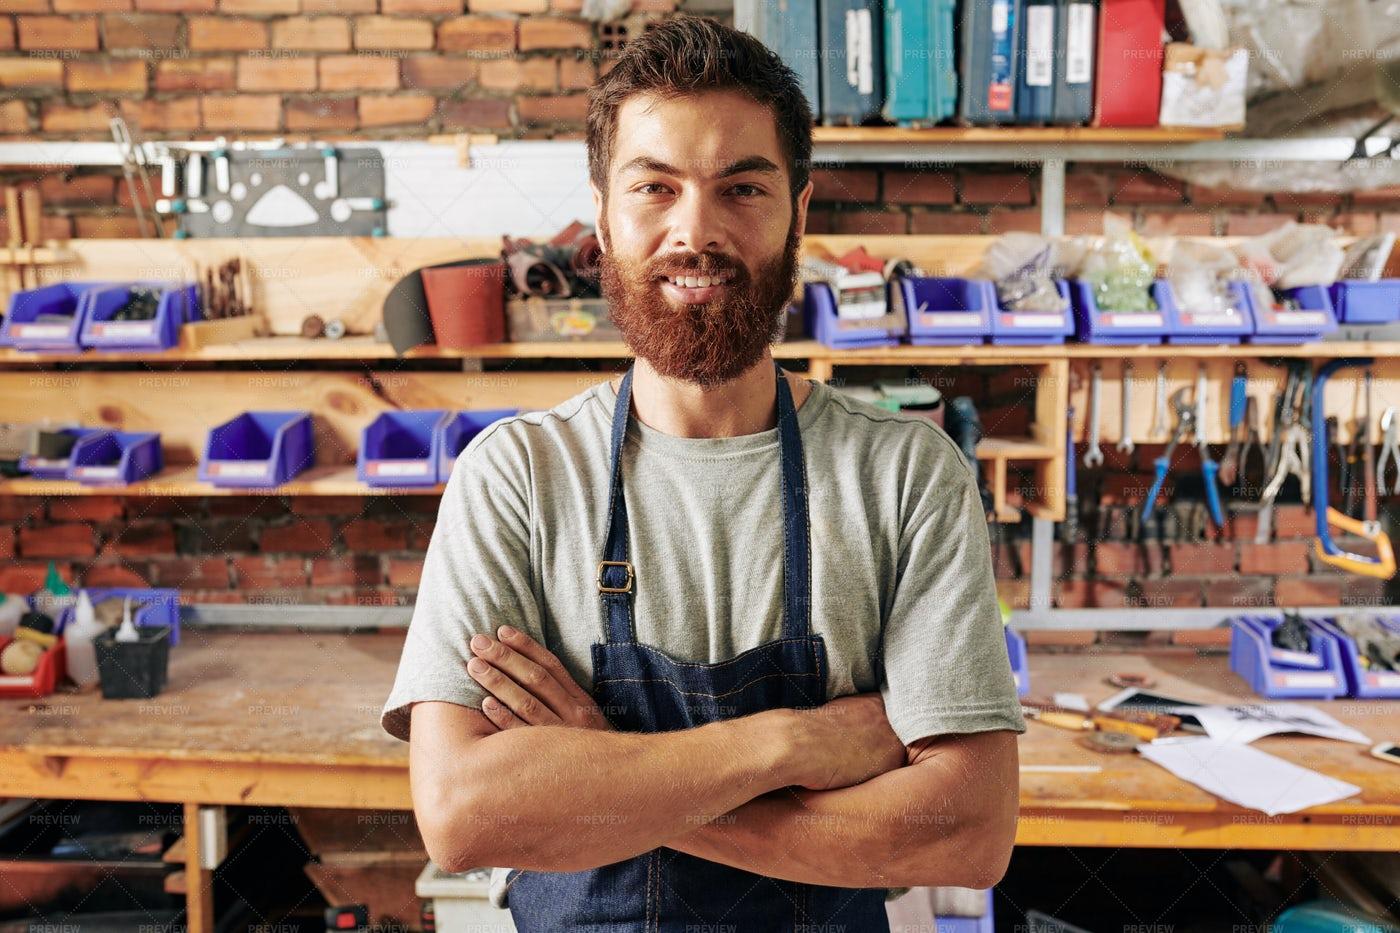 Smiling Confident Carpenter: Stock Photos